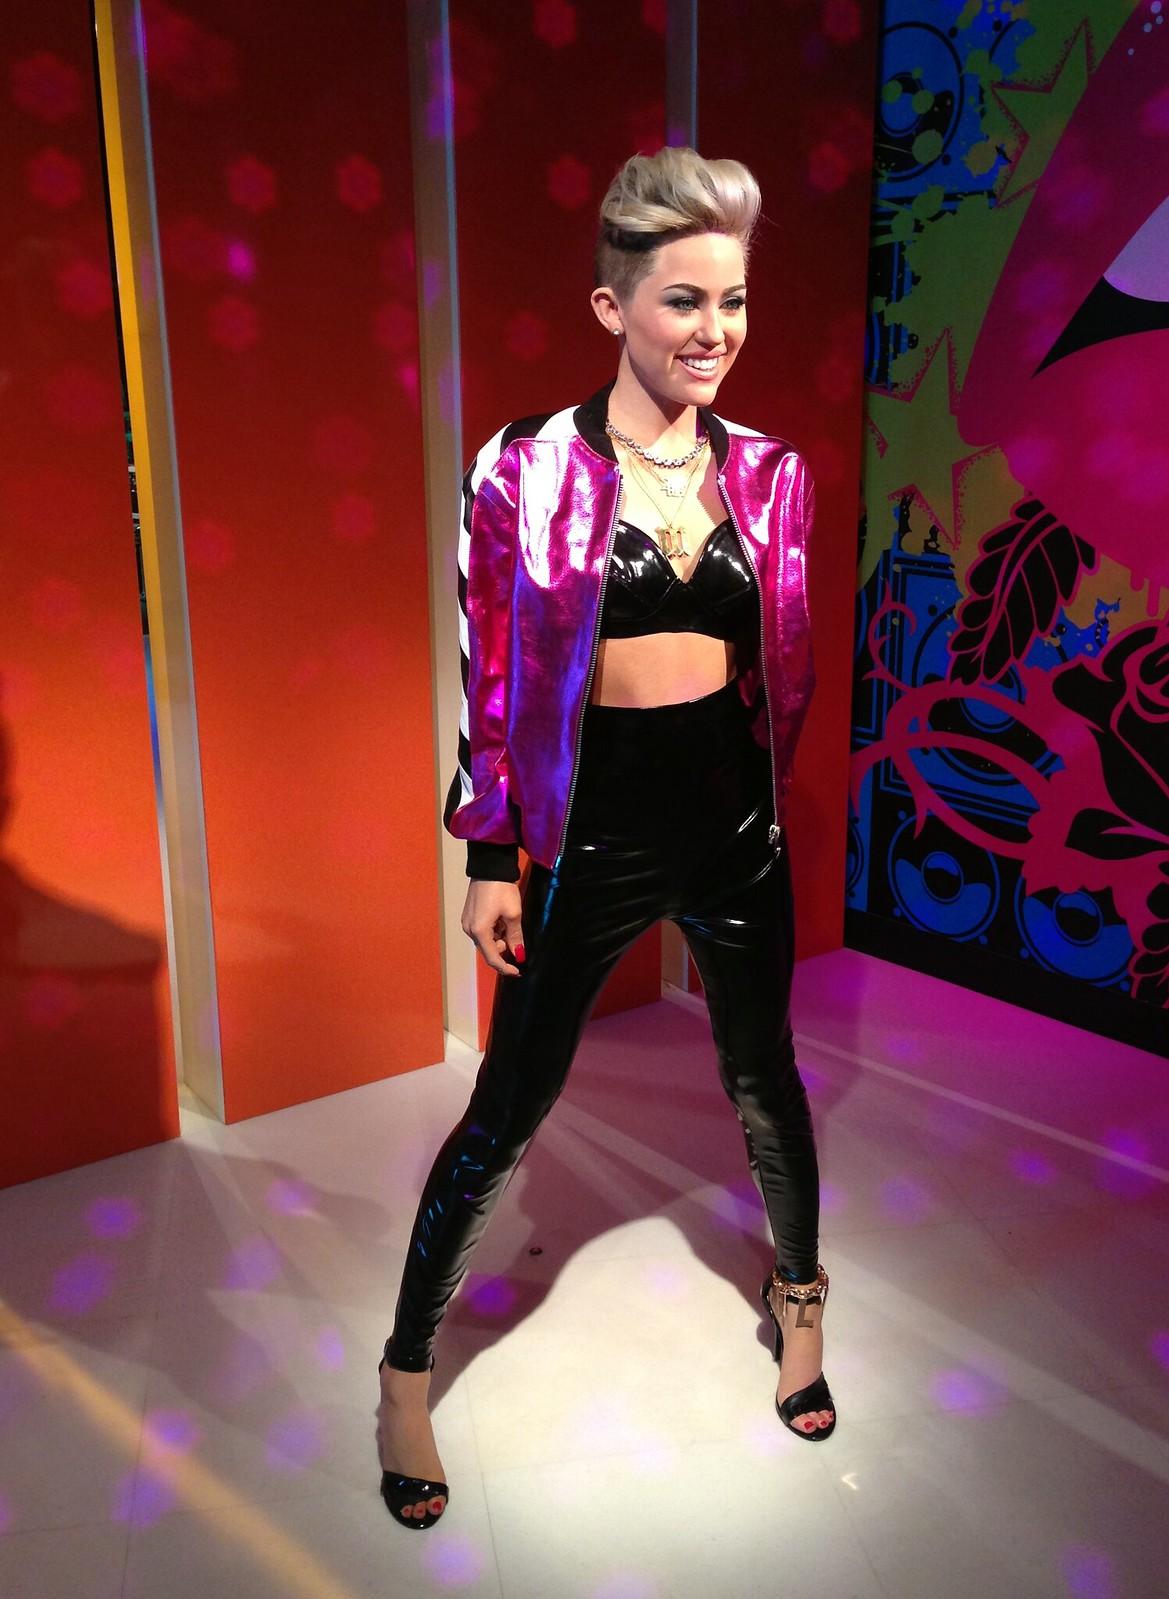 Orlando - Madame Tussauds Orlando - Miley Cyrus